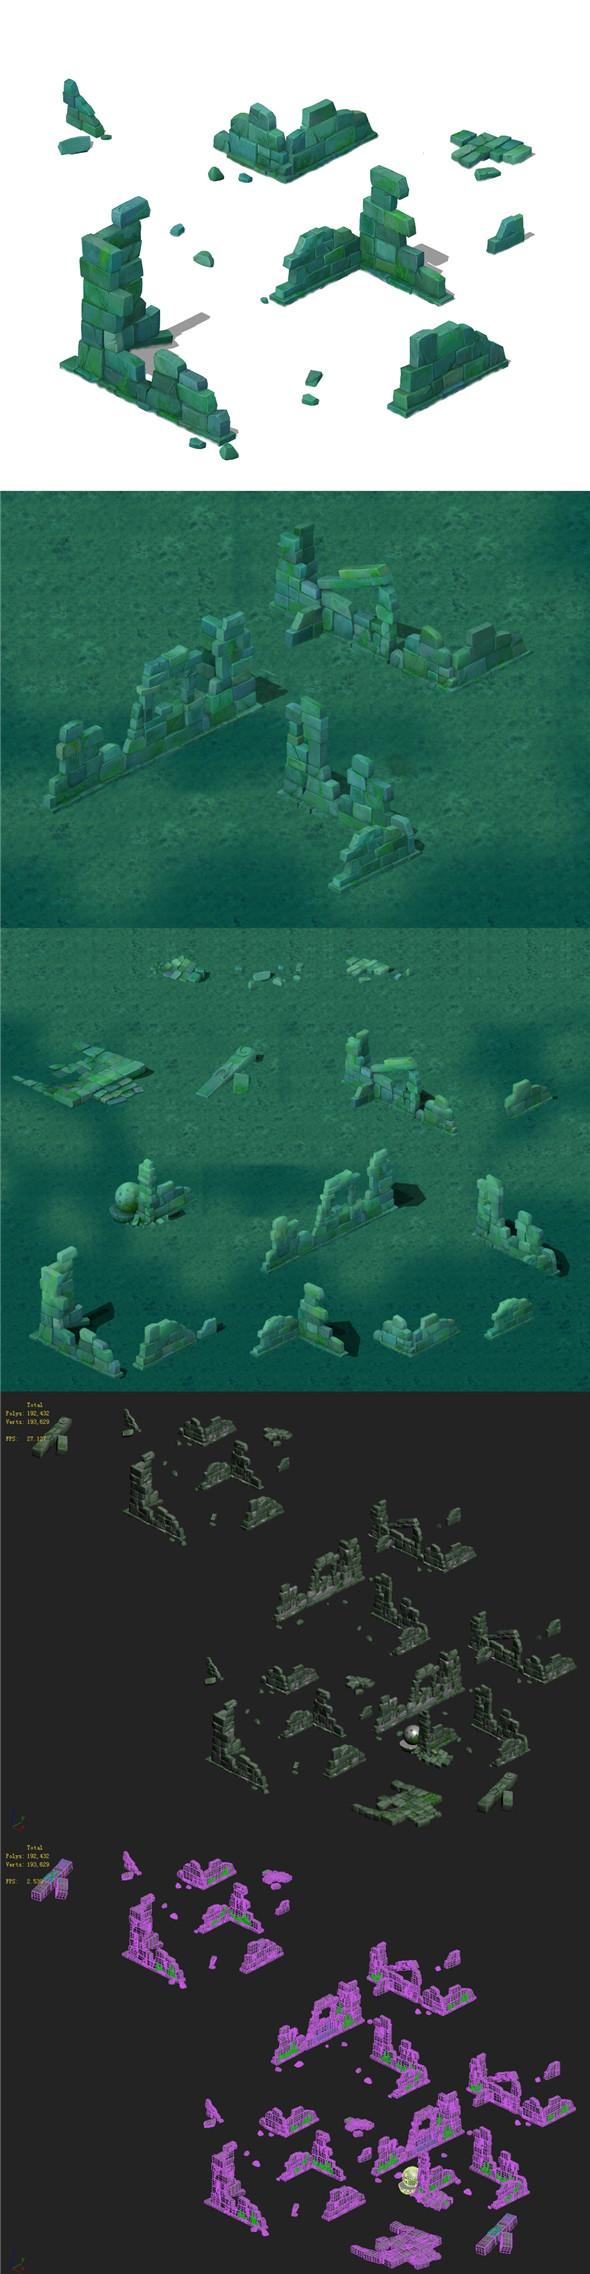 Cartoon version - abandoned site - 3DOcean Item for Sale